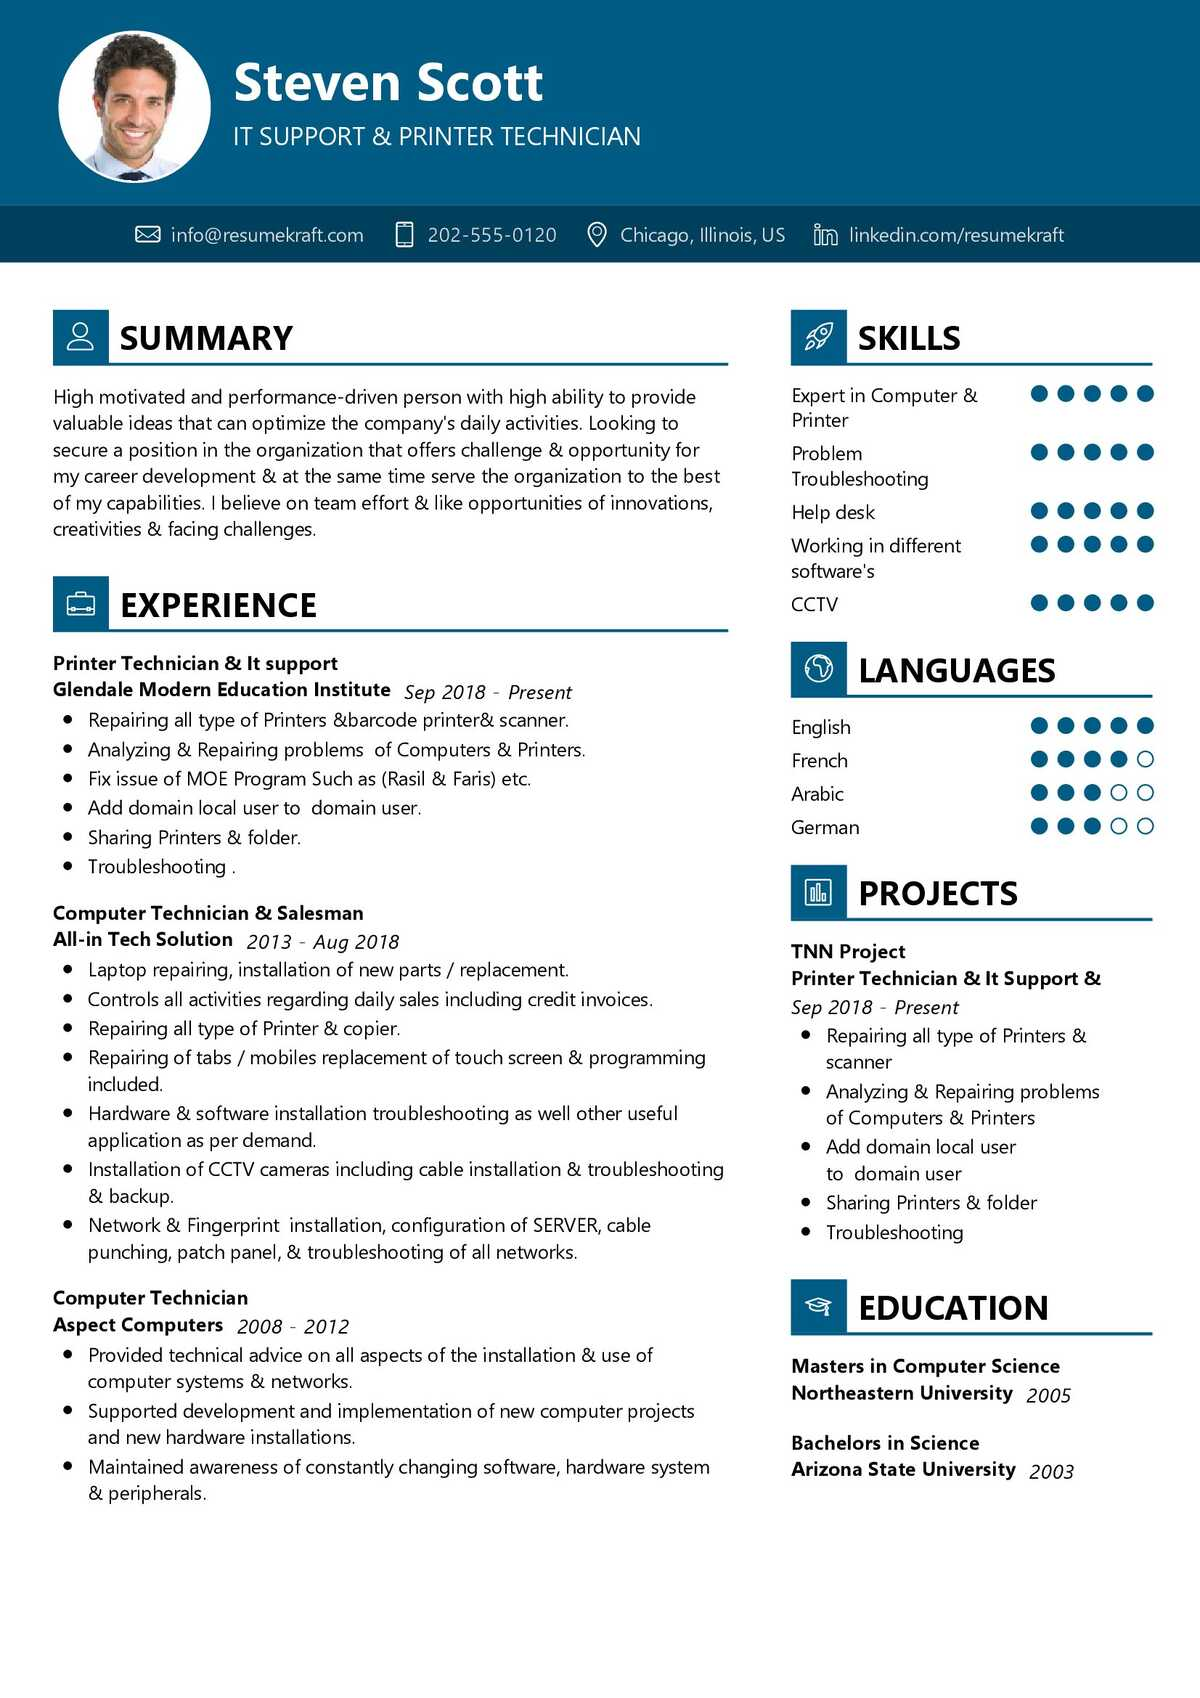 Mcitp resume format sample essays describing oneself